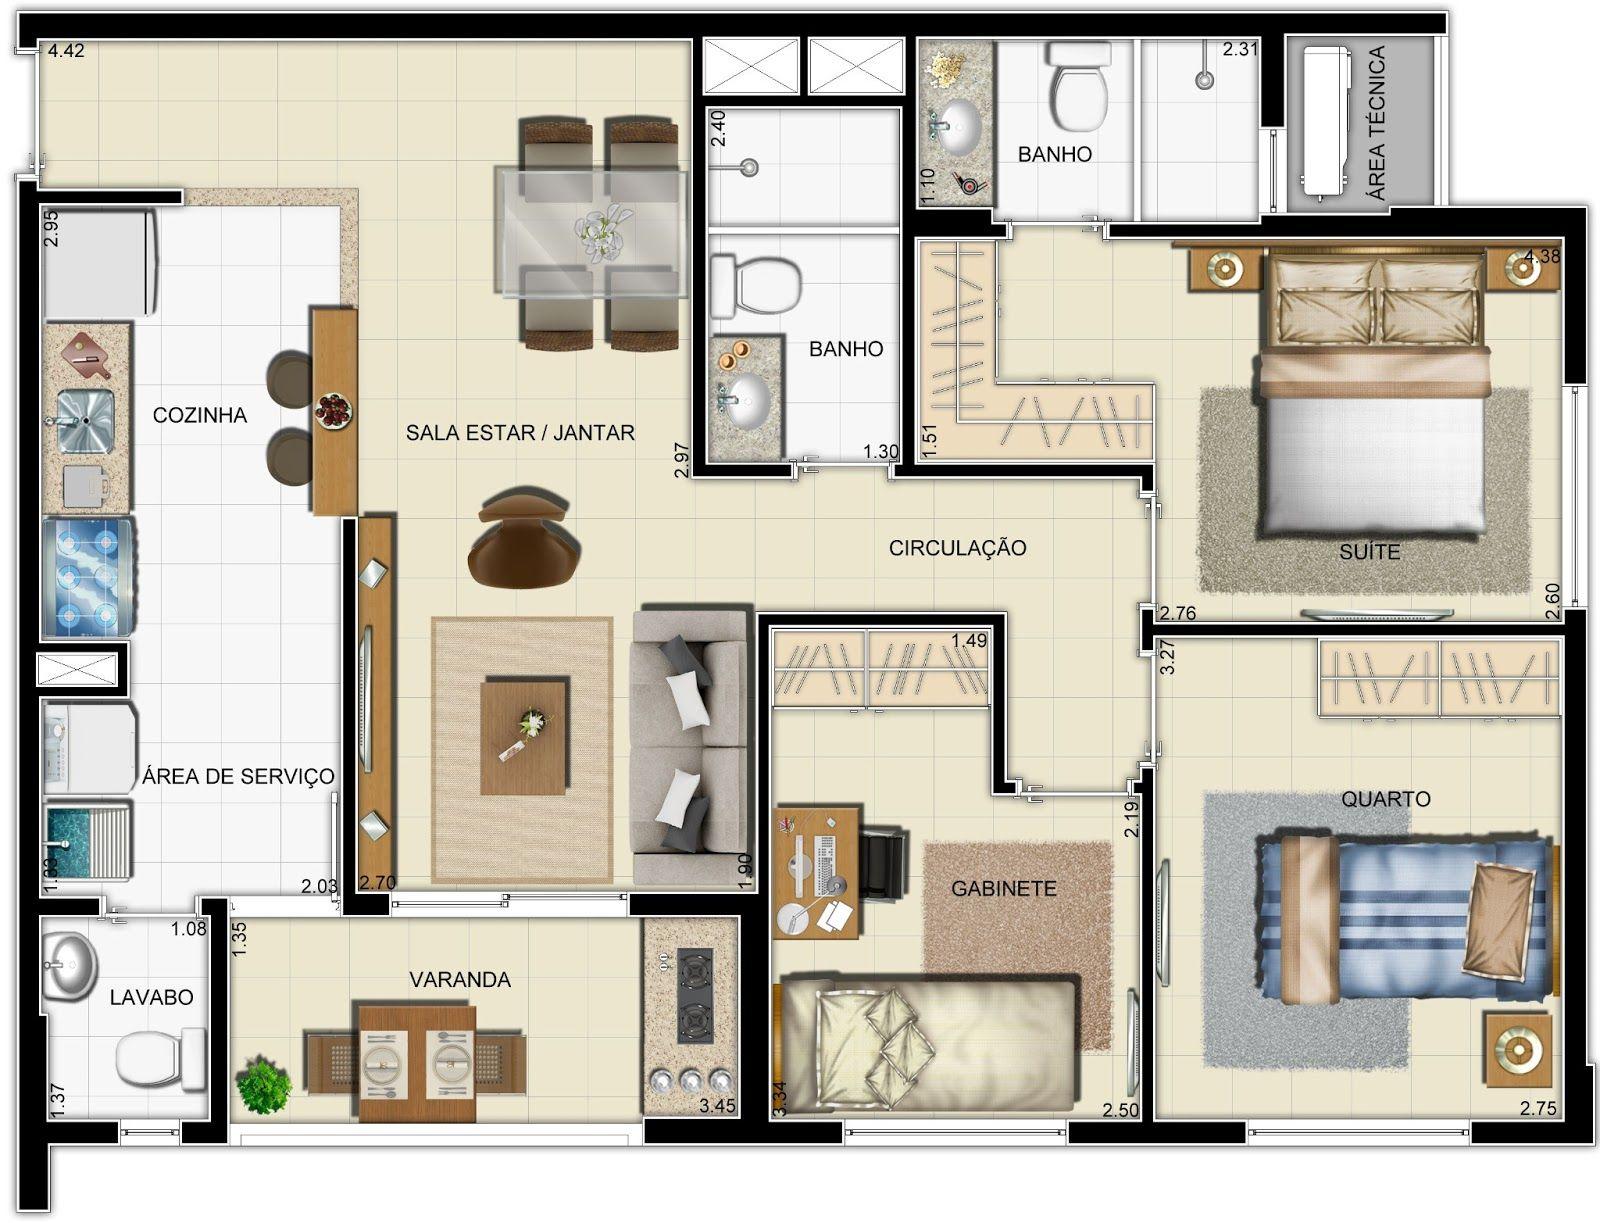 Planta casa pequena planos pinterest planos - Plantas pequenas de interior ...